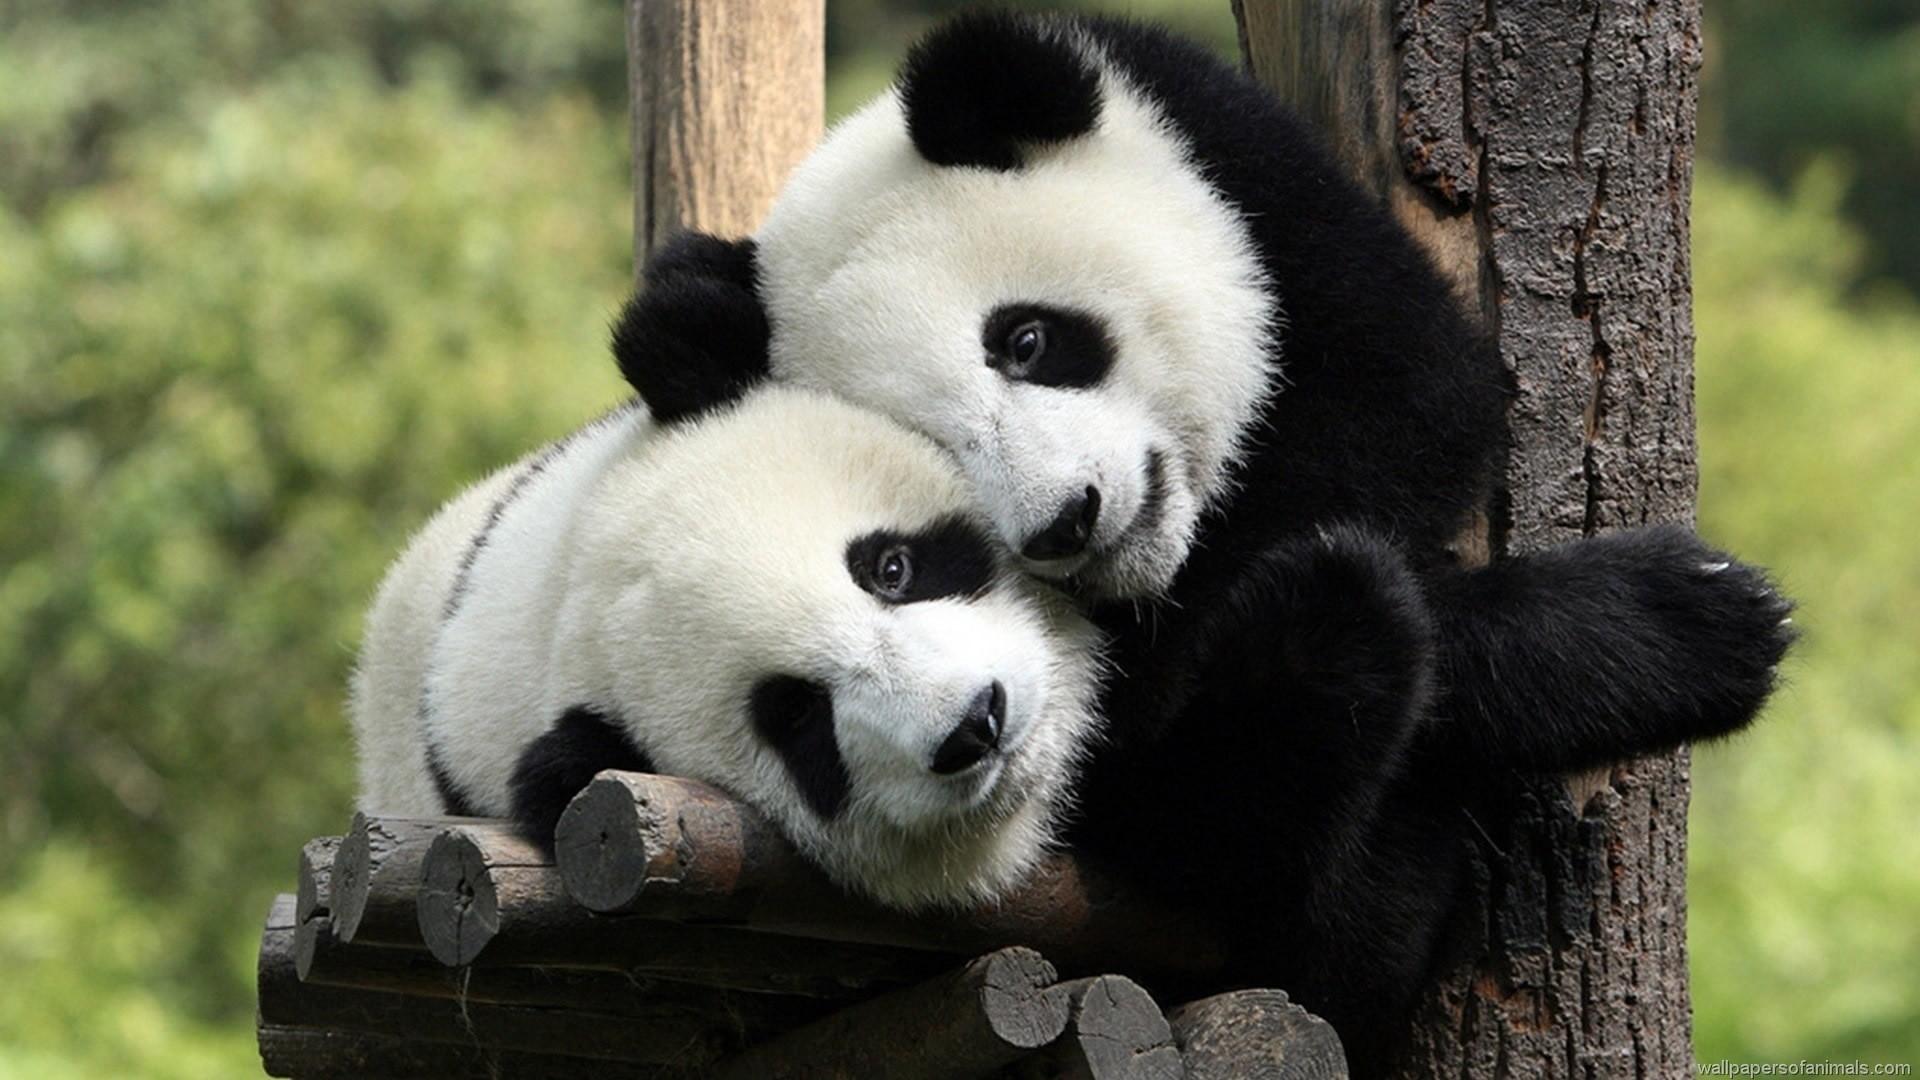 Baby Panda Wallpaper. Baby Red Panda